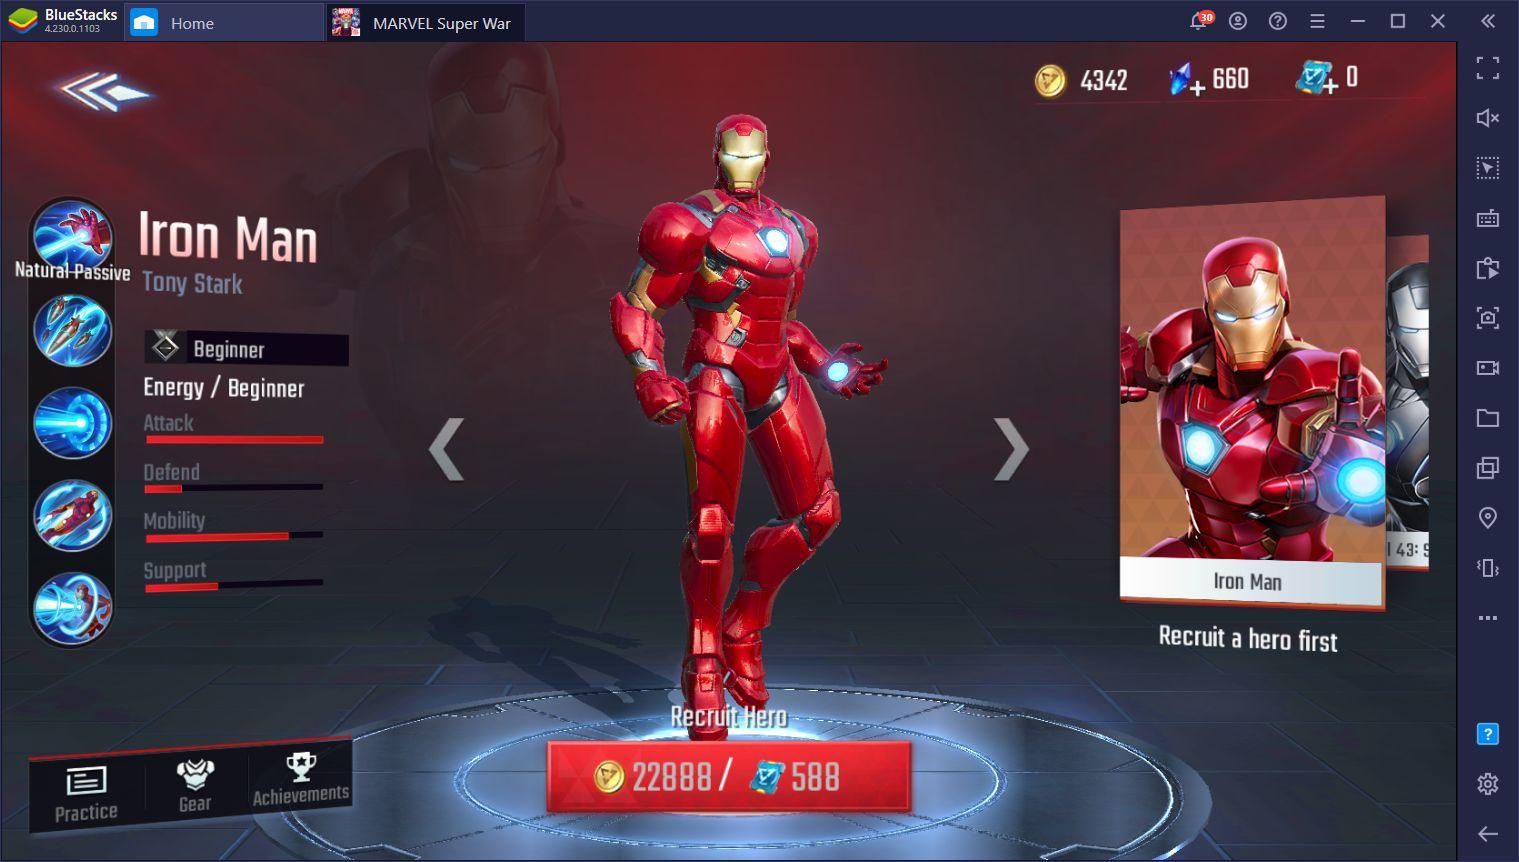 Marvel Super War – Understanding the Different Character Roles